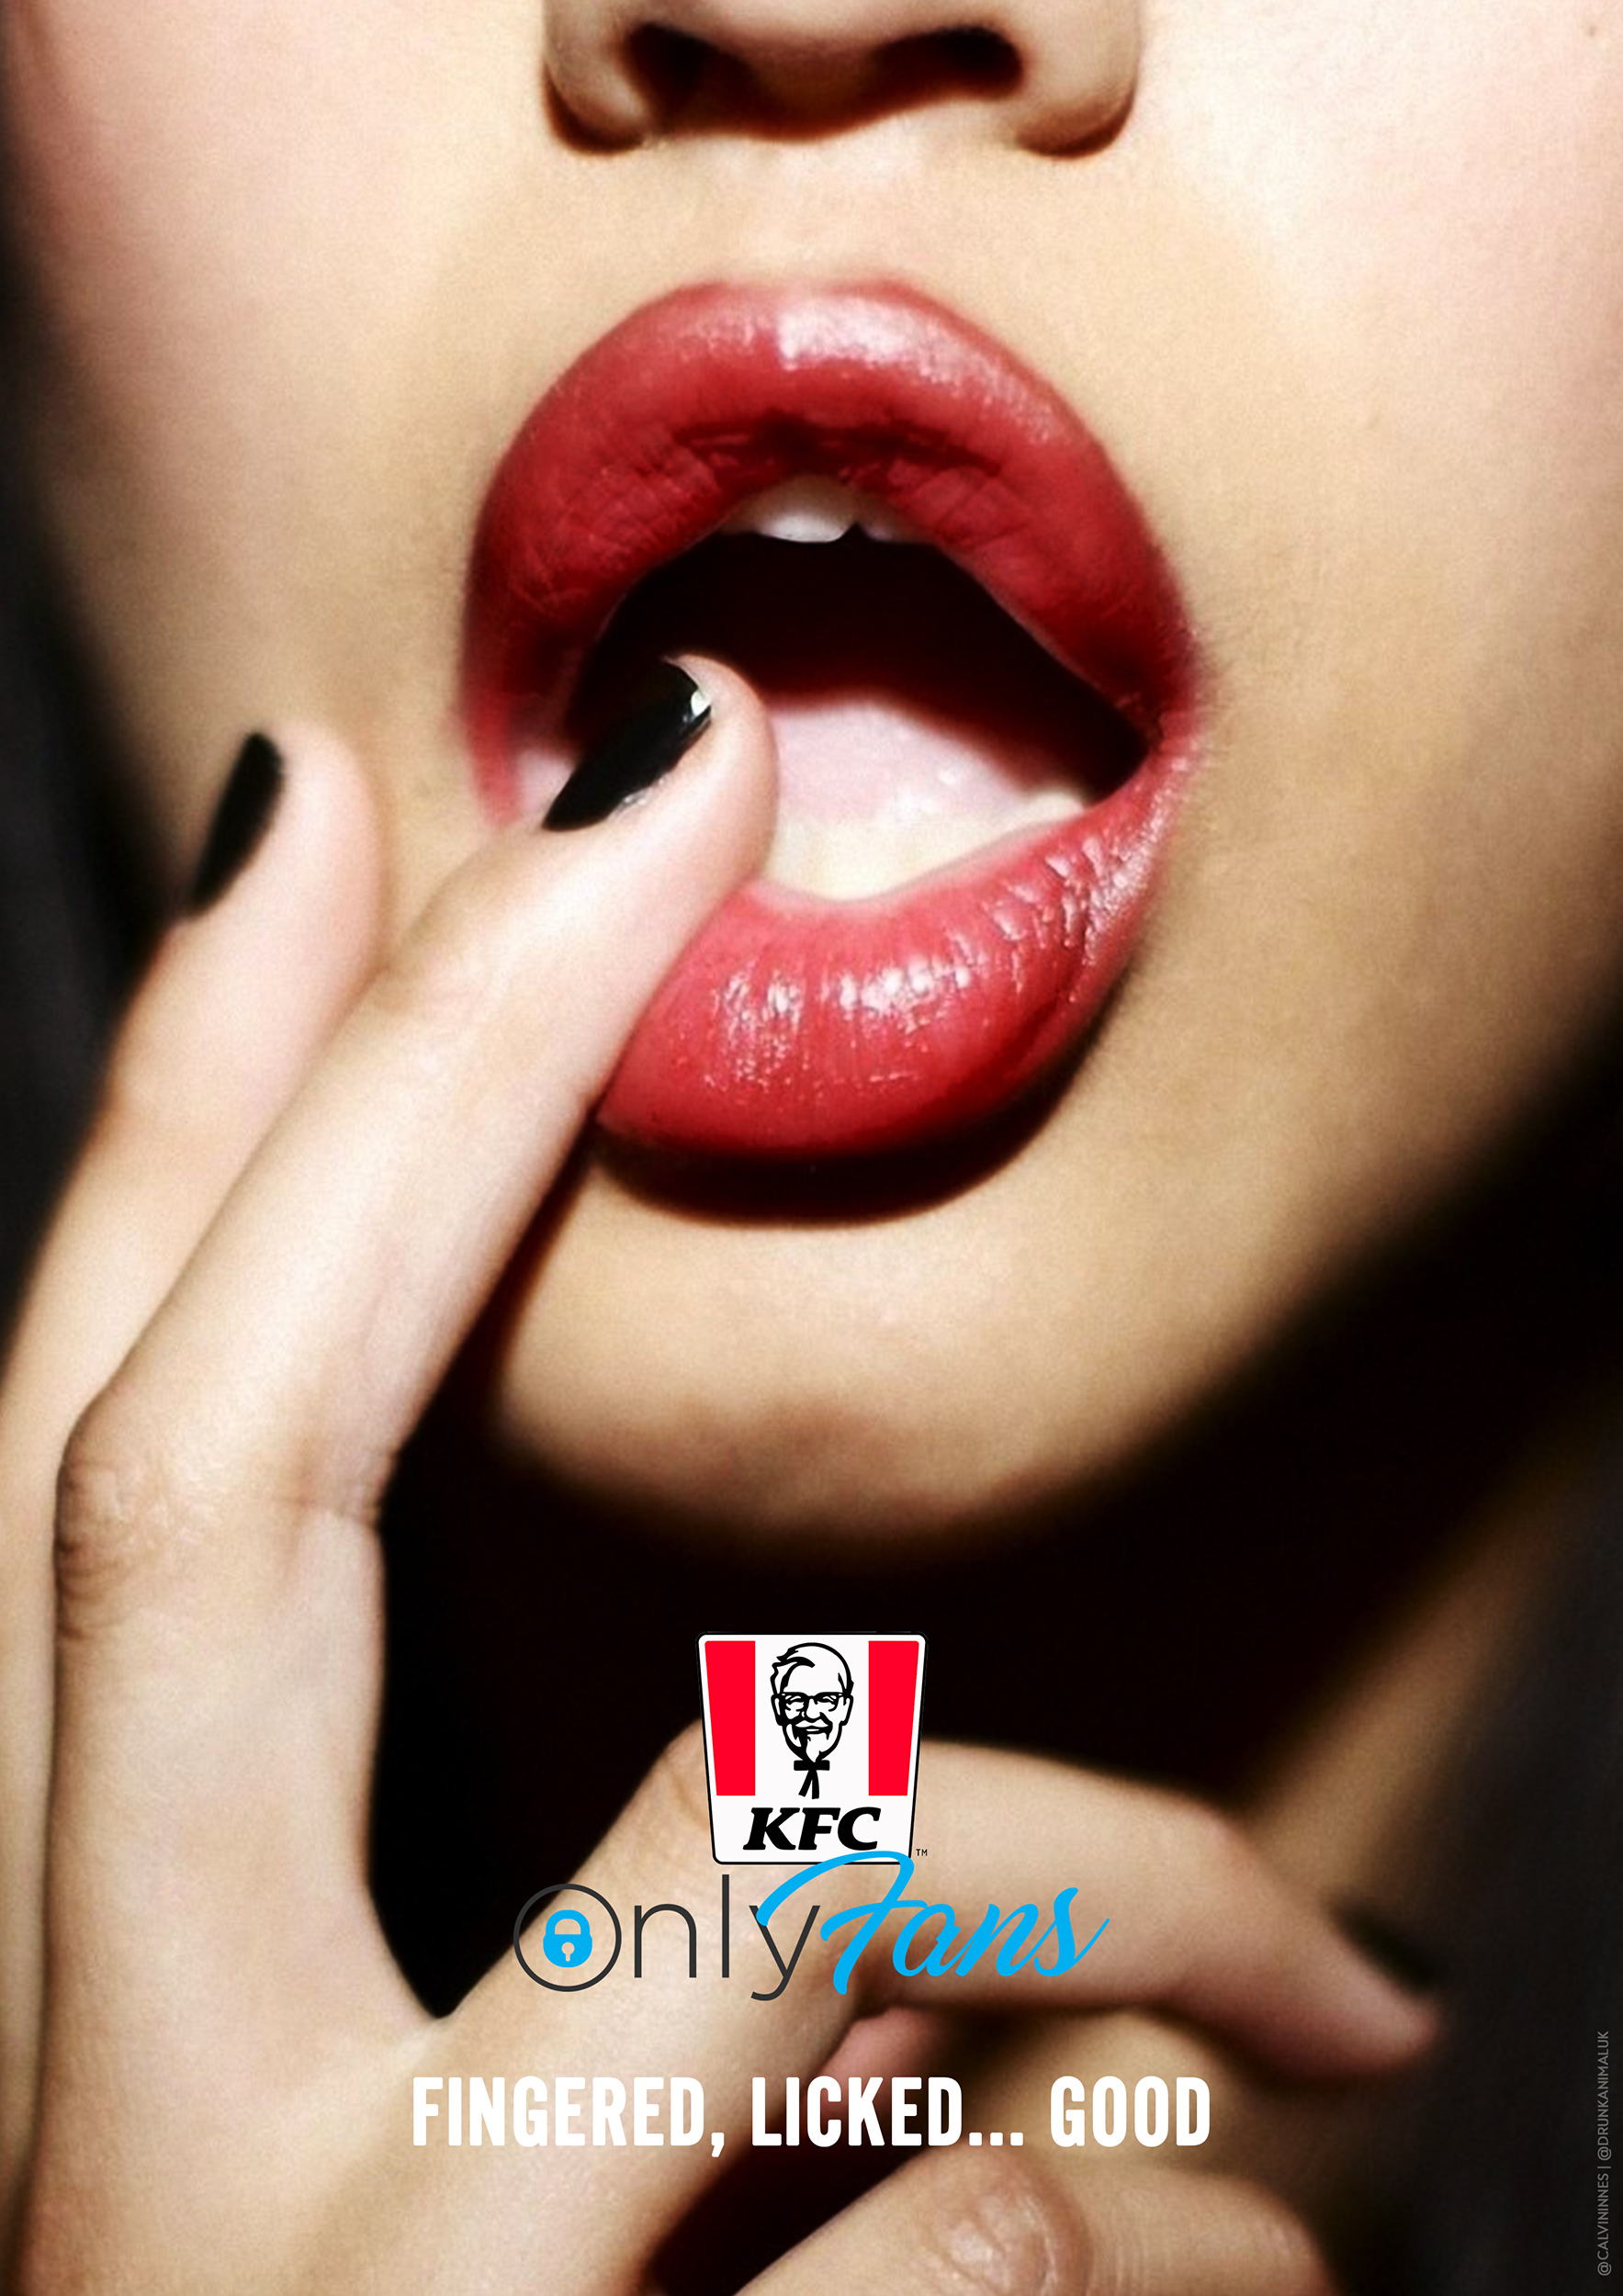 KFC OnlyFans advertisement